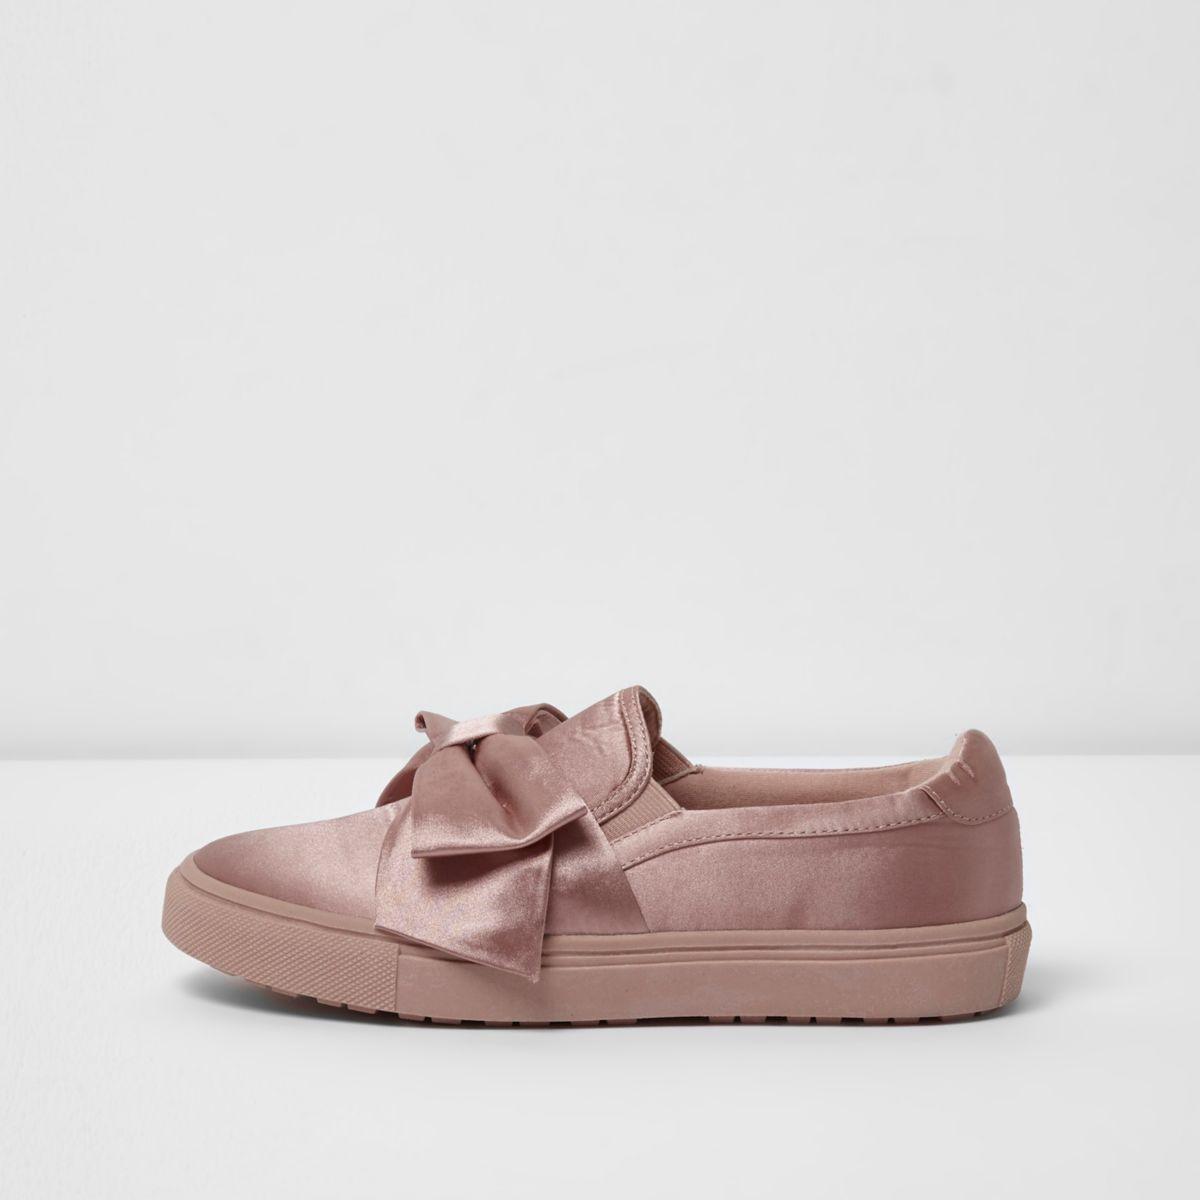 Pink bow top satin slip on plimsolls